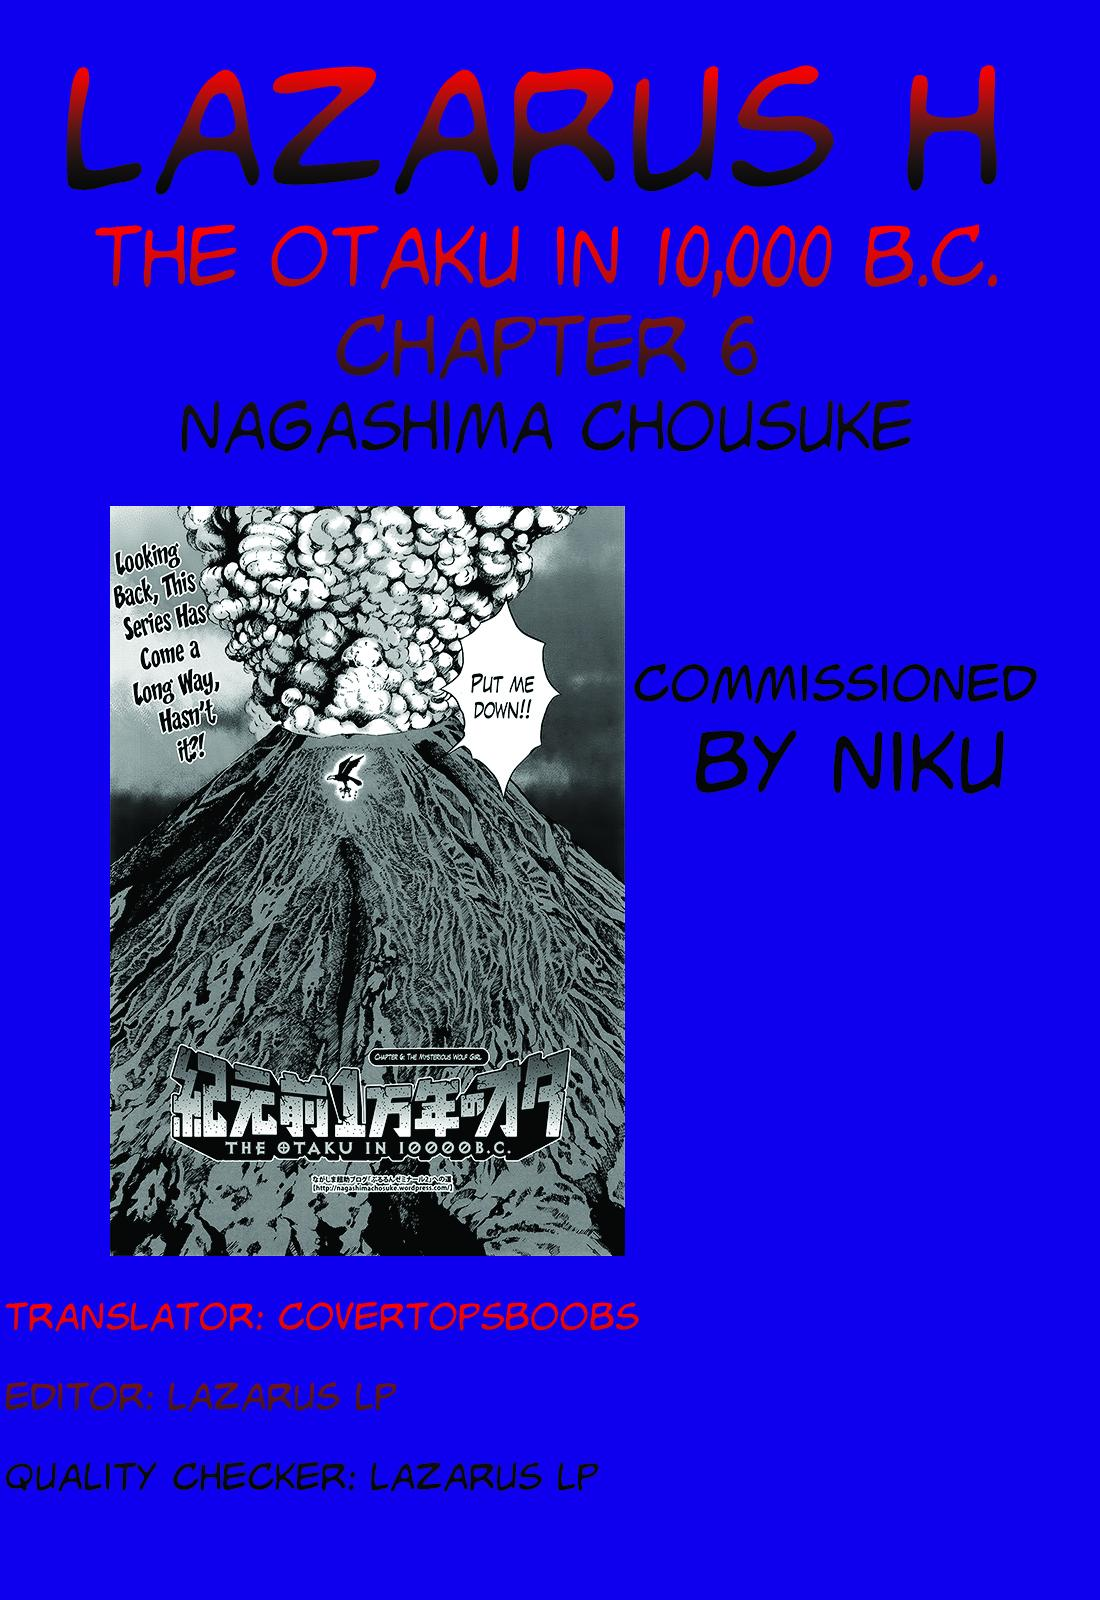 Kigenzen 10000 Nen no Ota   The Otaku in 10,000 B.C. Ch. 1-6 117